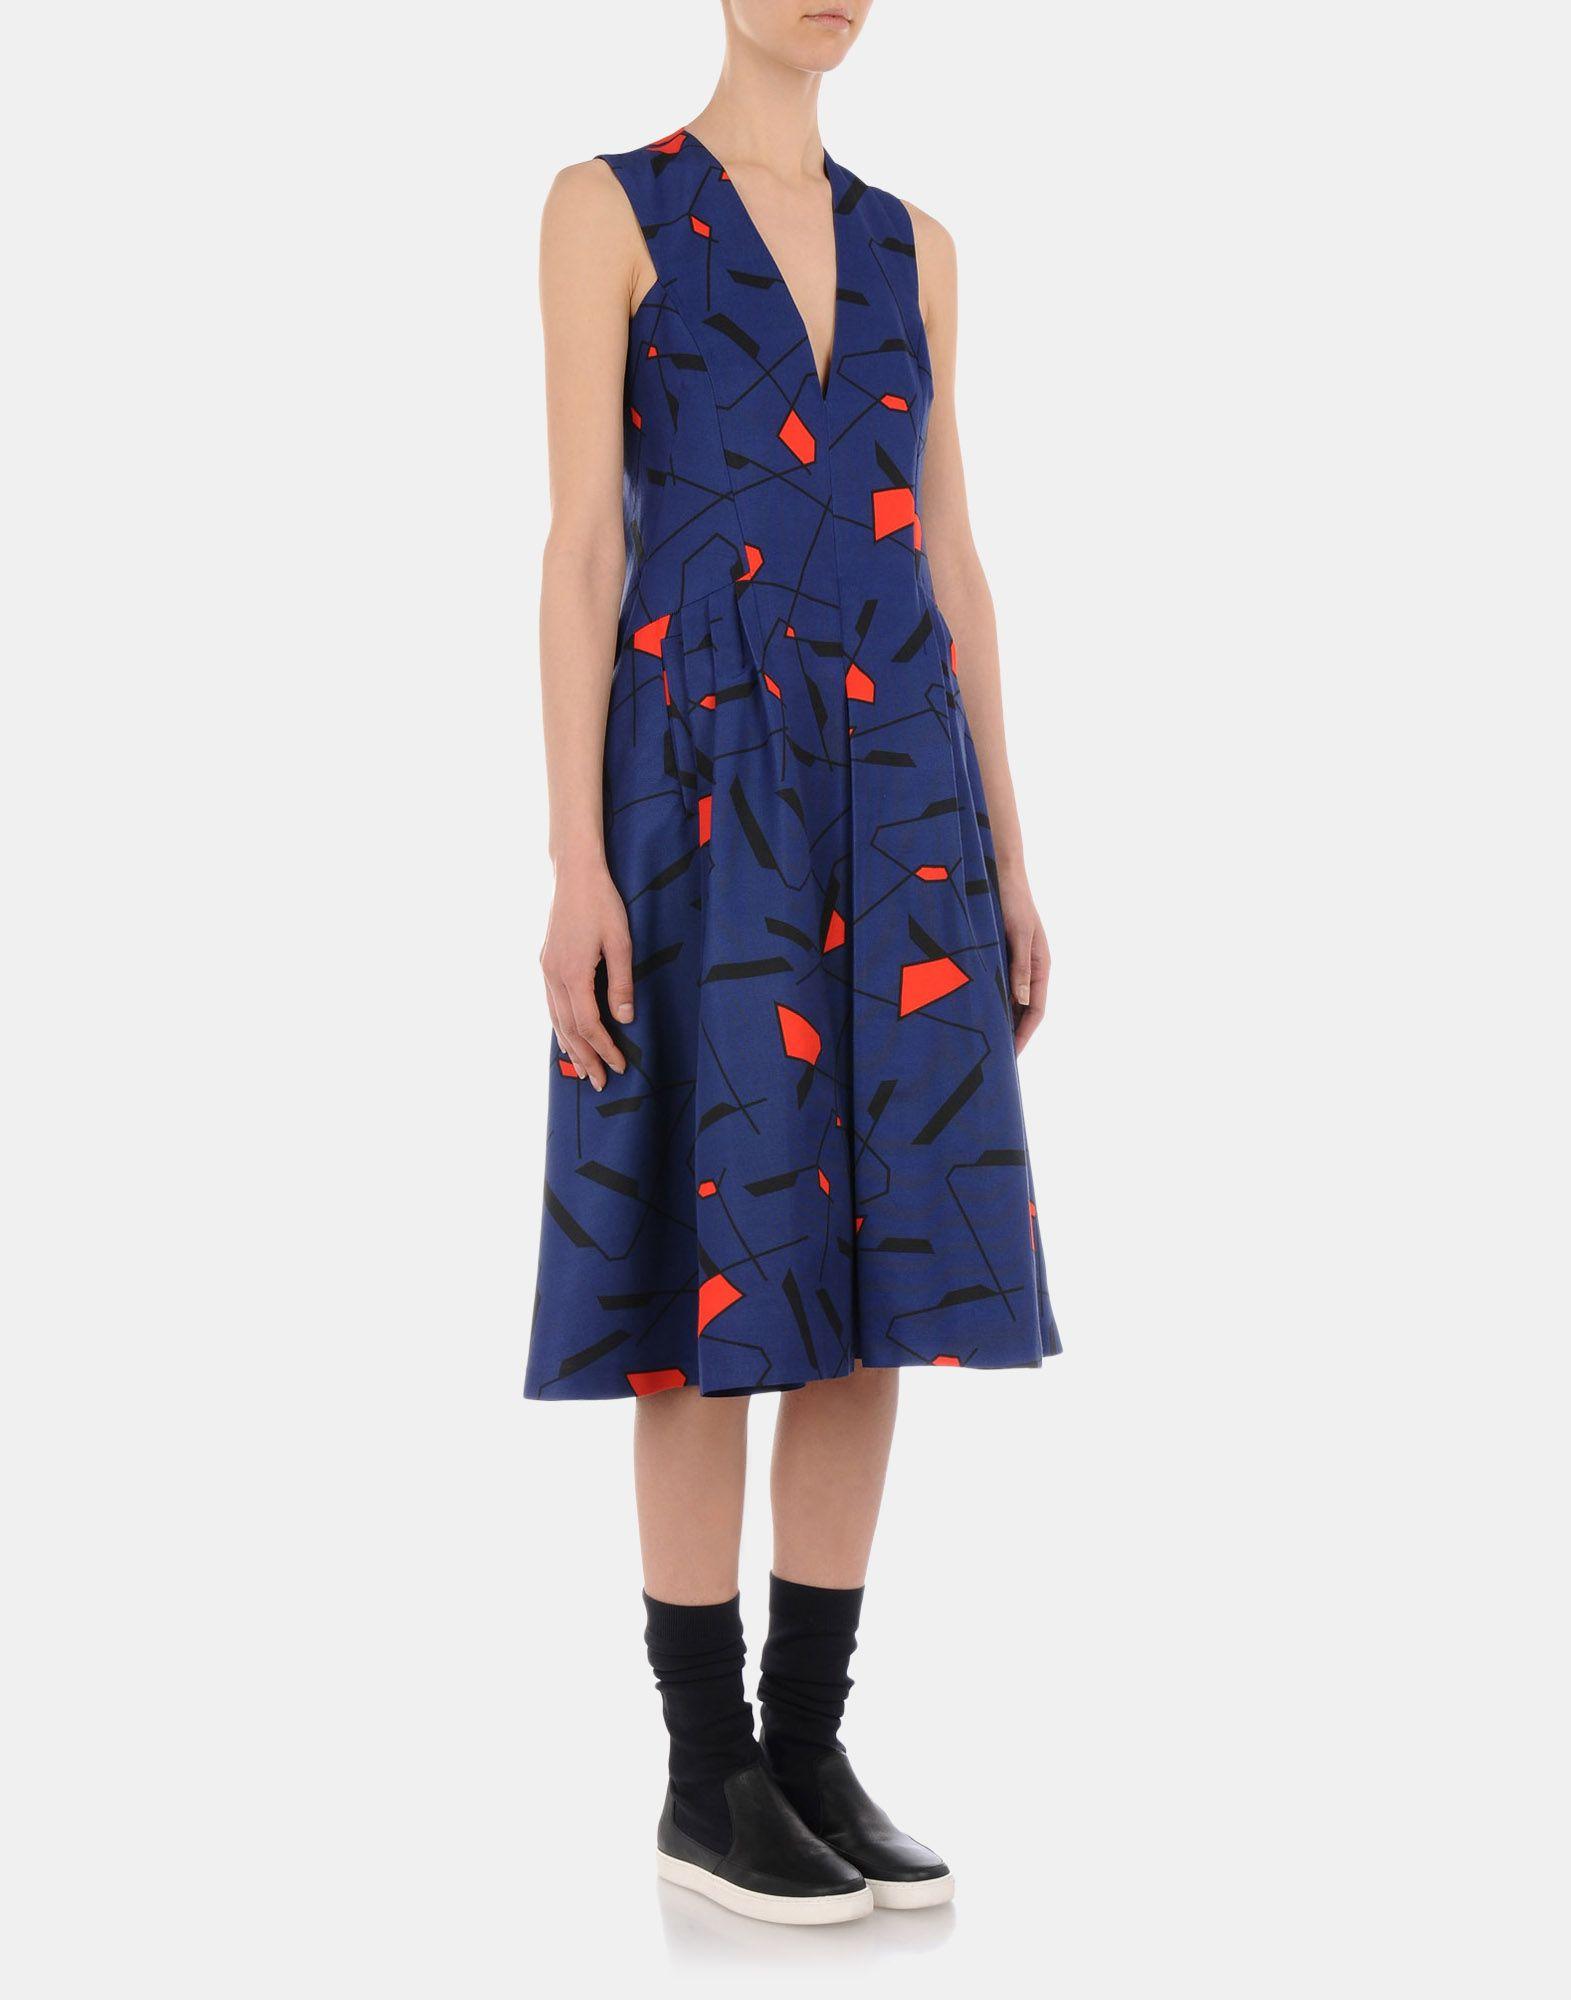 3/4 length dress - JIL SANDER NAVY Online Store